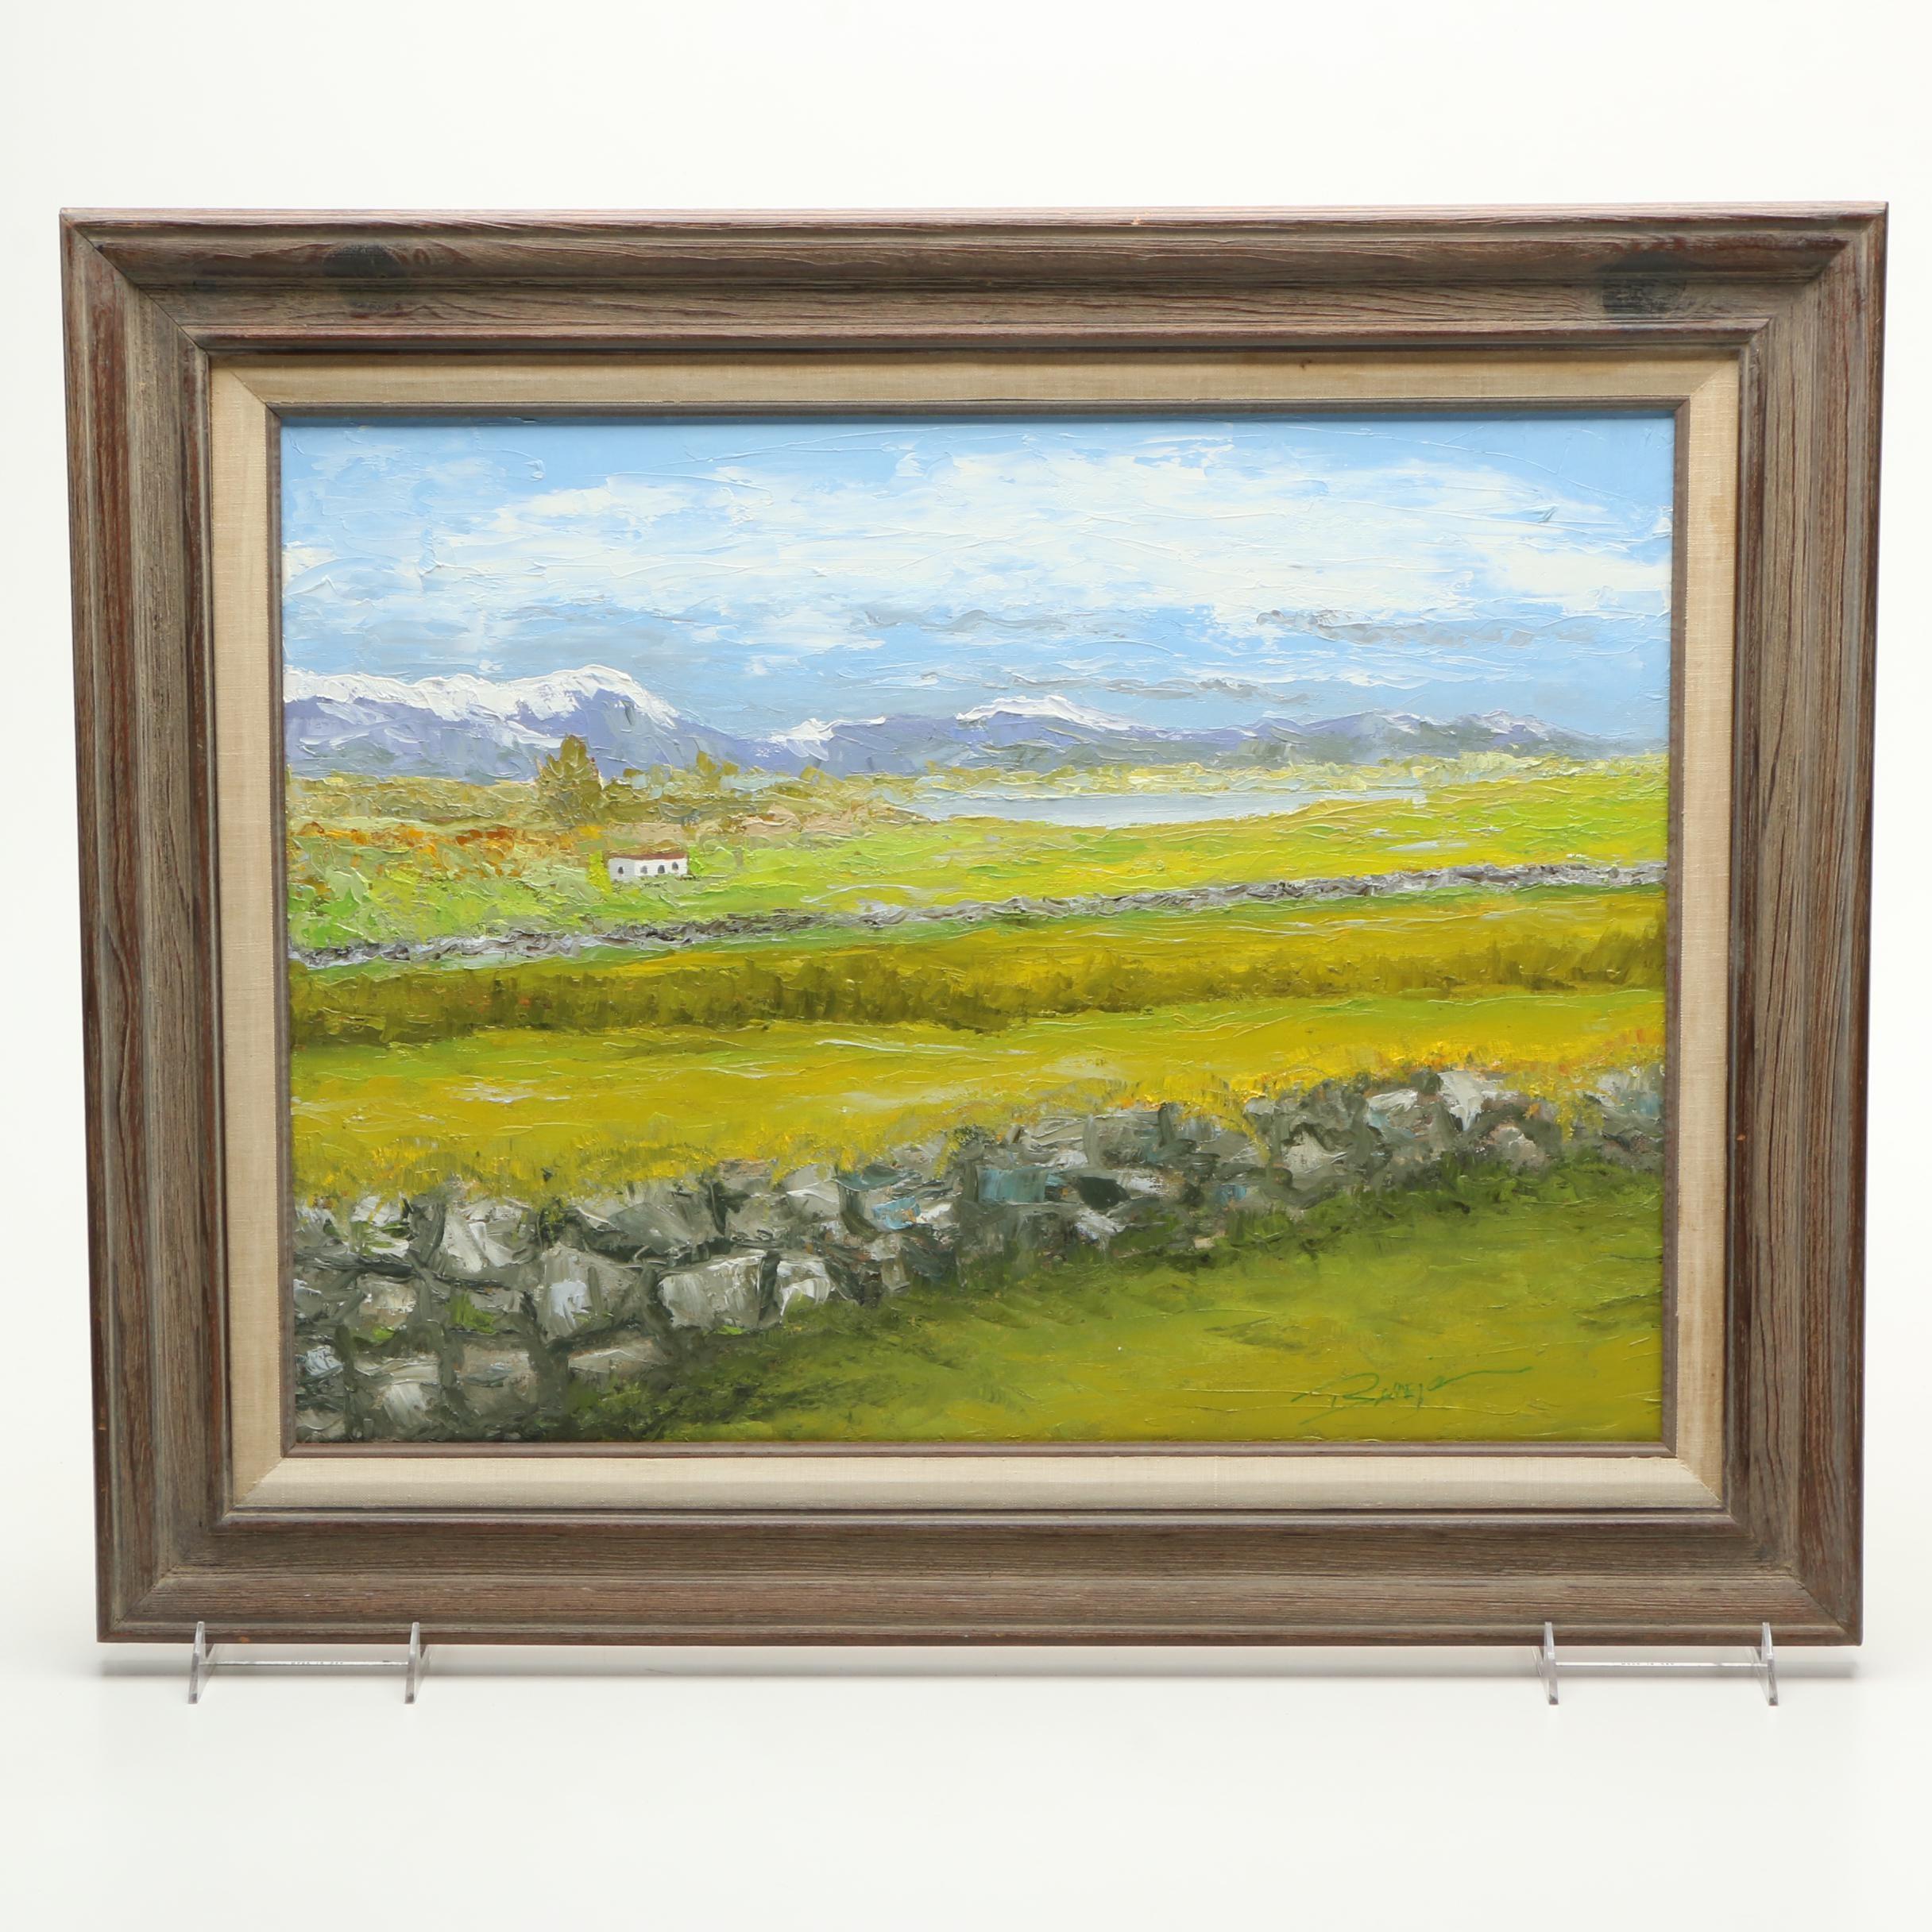 Ben Benjamin Oil on Canvas Landscape Painting